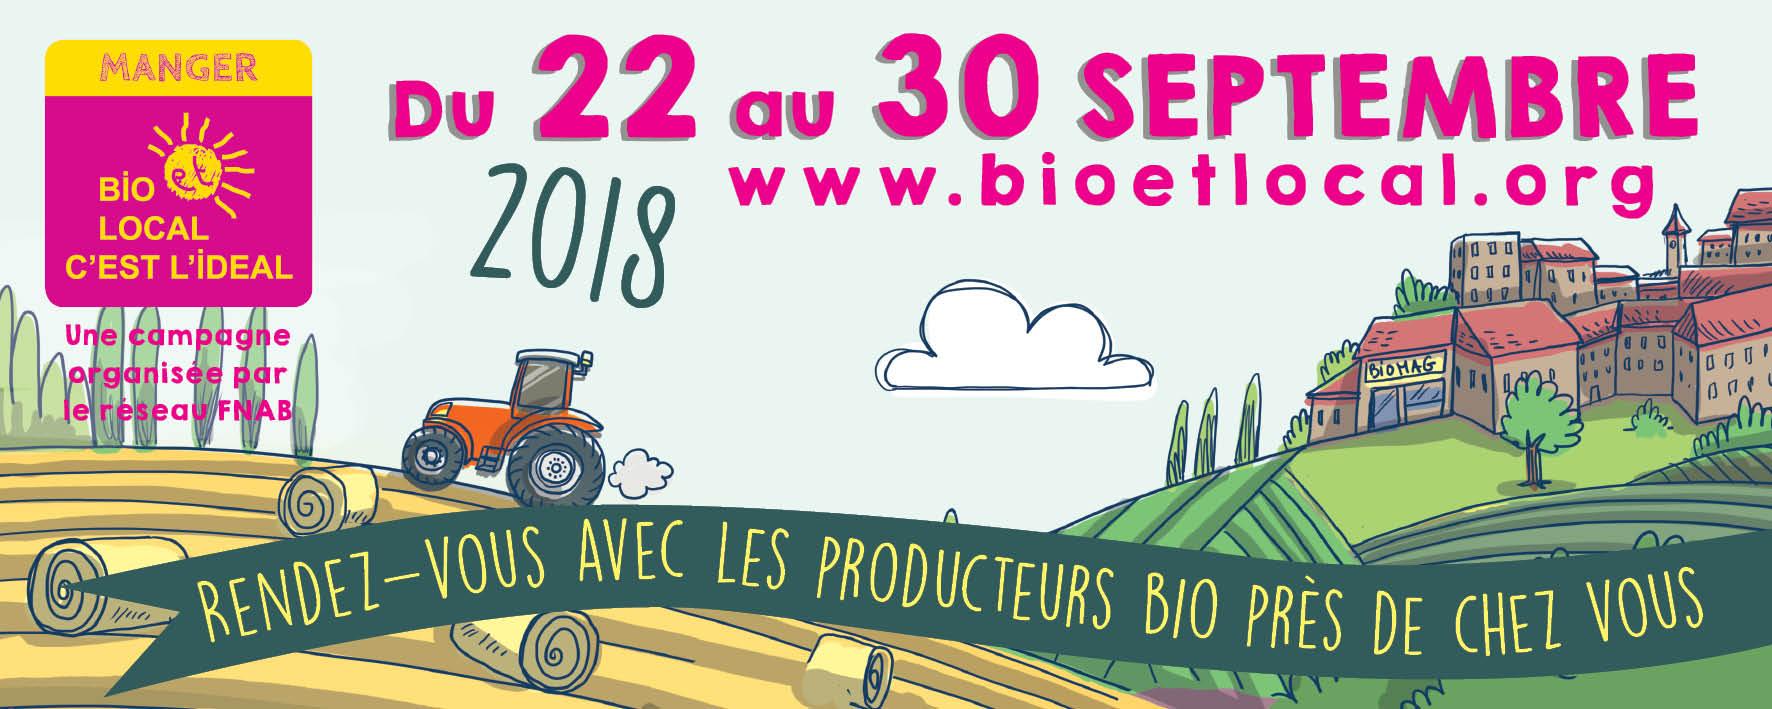 Bandeau MBEL 2018 avec dates